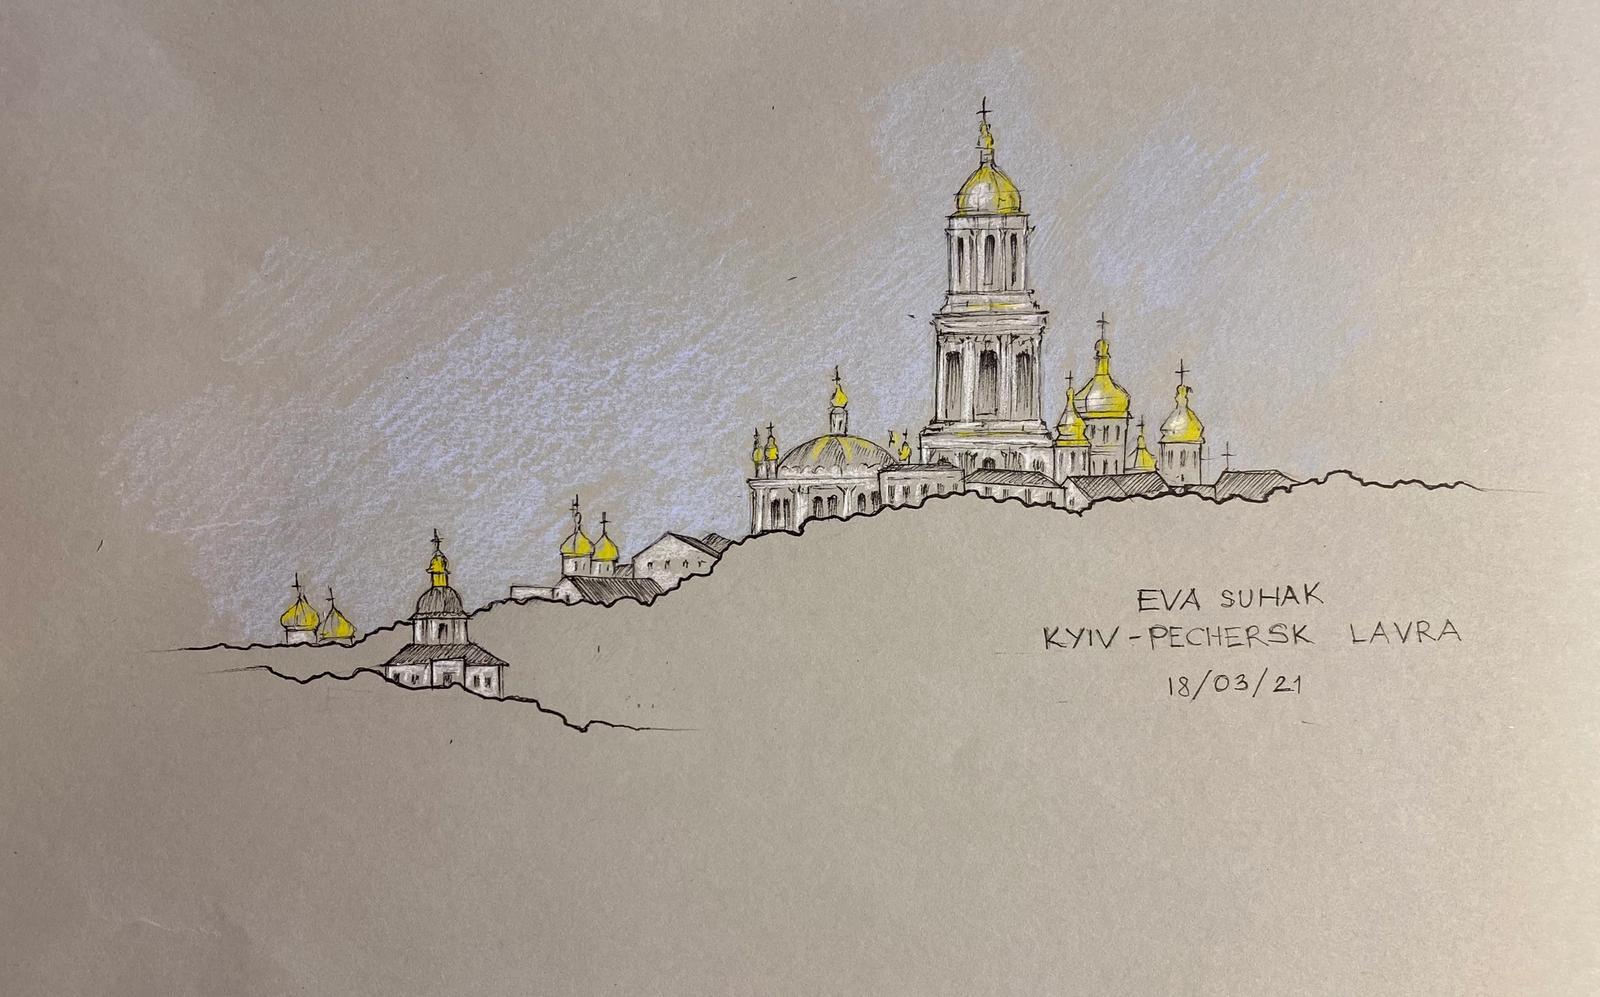 Kyiv-Pechersk Lavra - 1